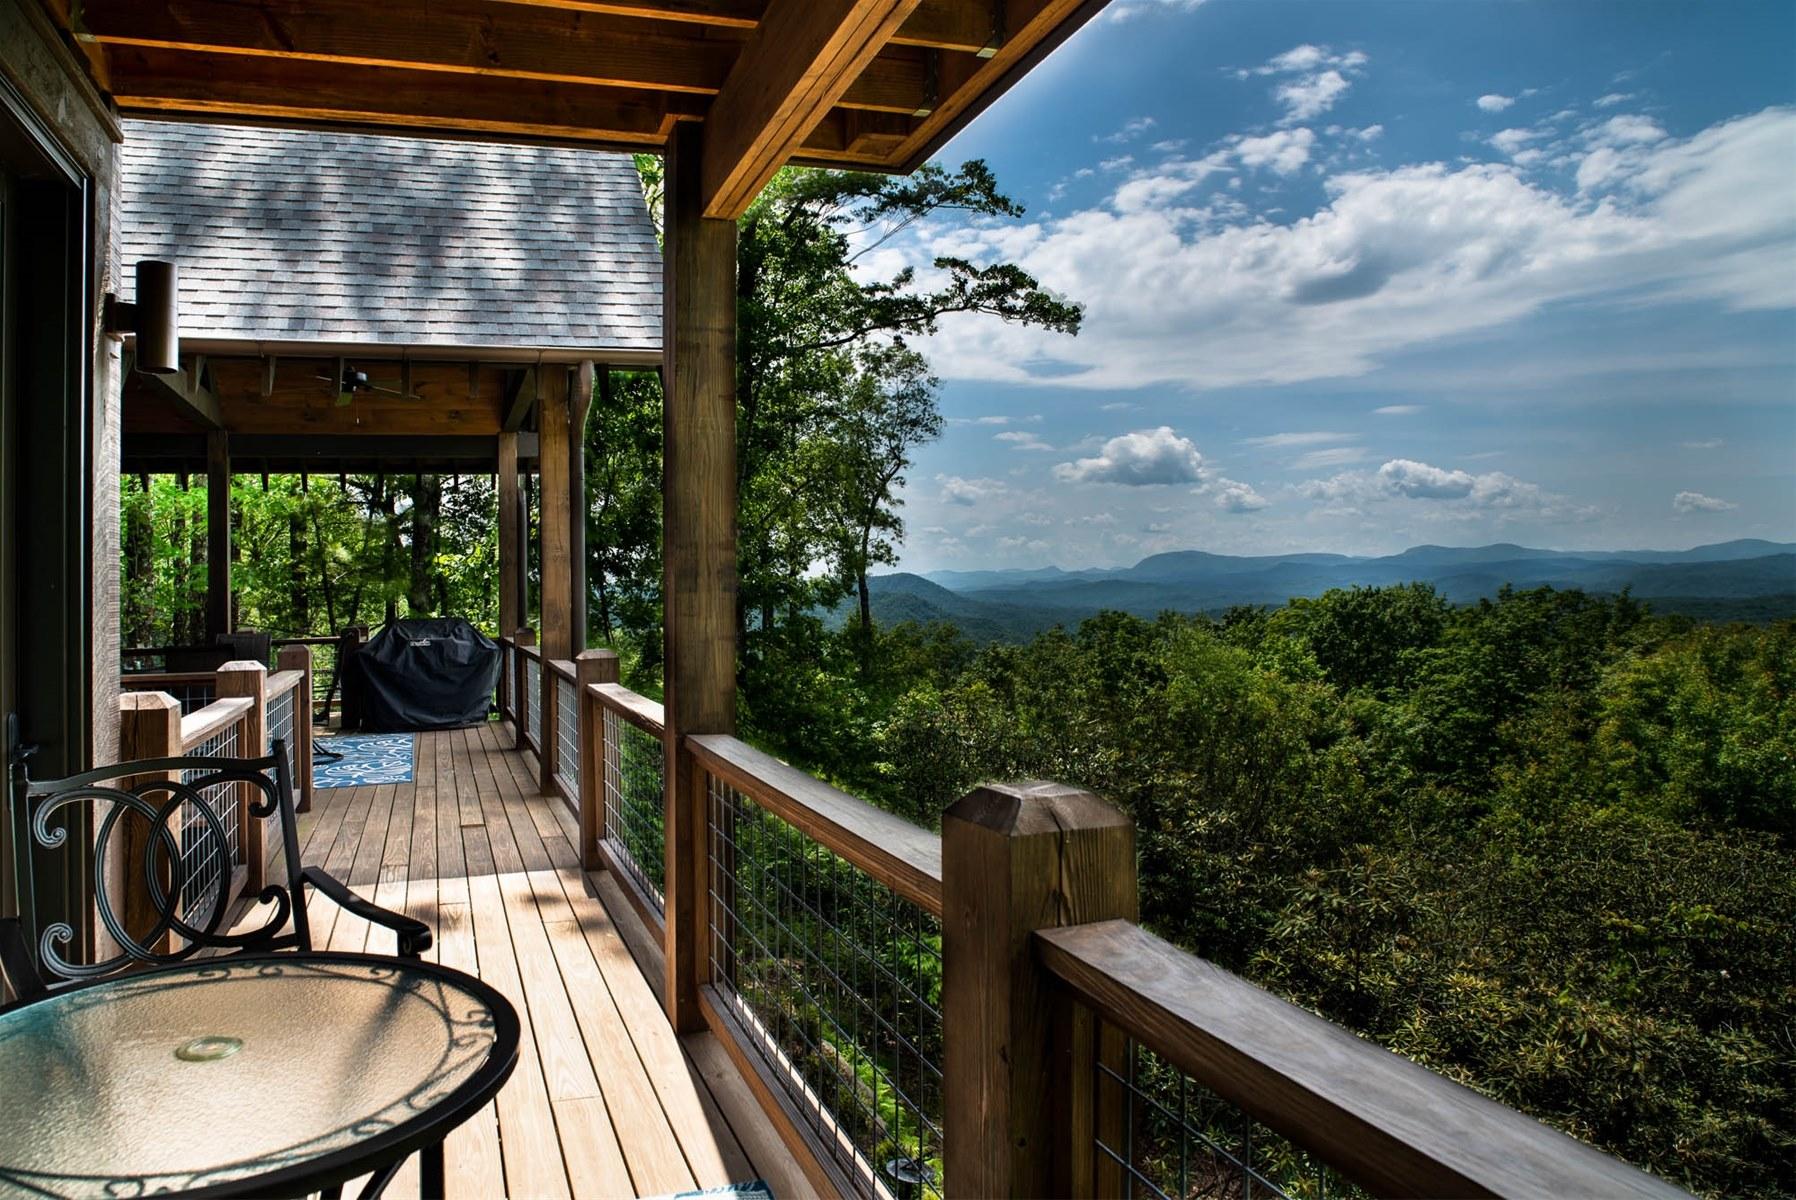 Residential Property Management Sales Vacation Rental Management Company Brevard Ashville Area North Carolina